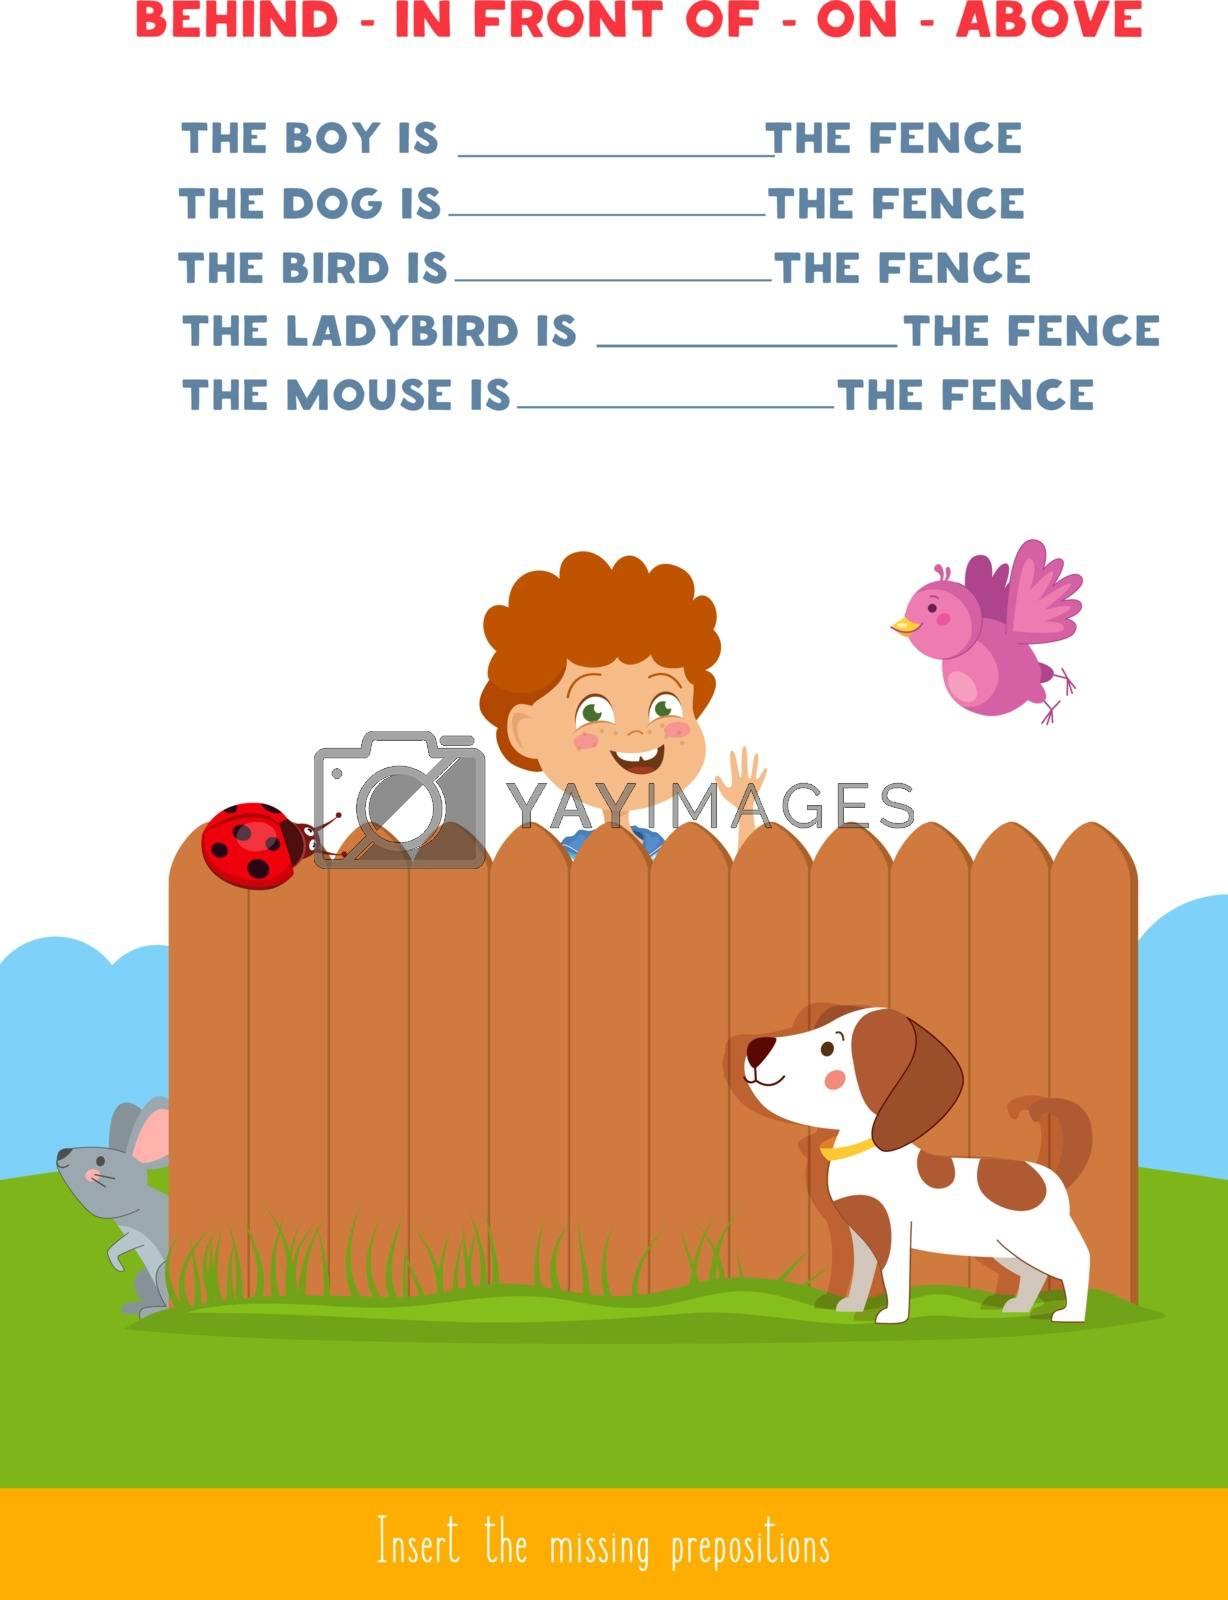 Educational children game. Insert the missing prepositions